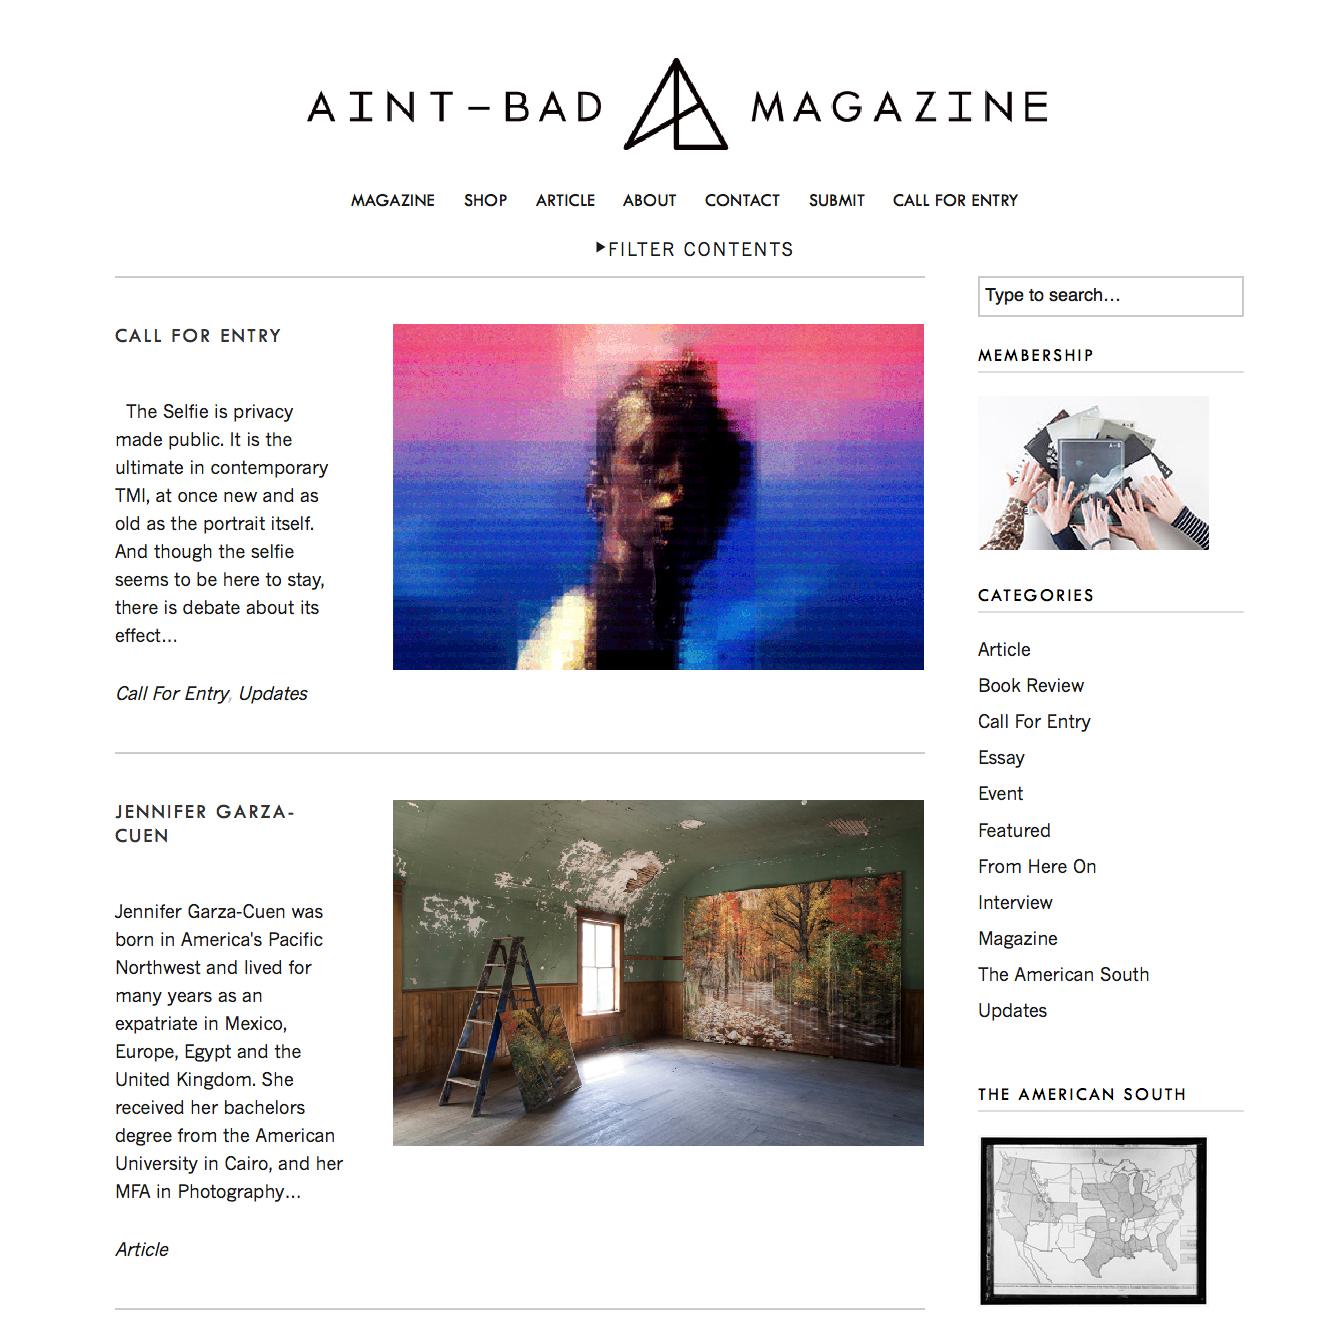 aint-bad-magazine_001.jpg